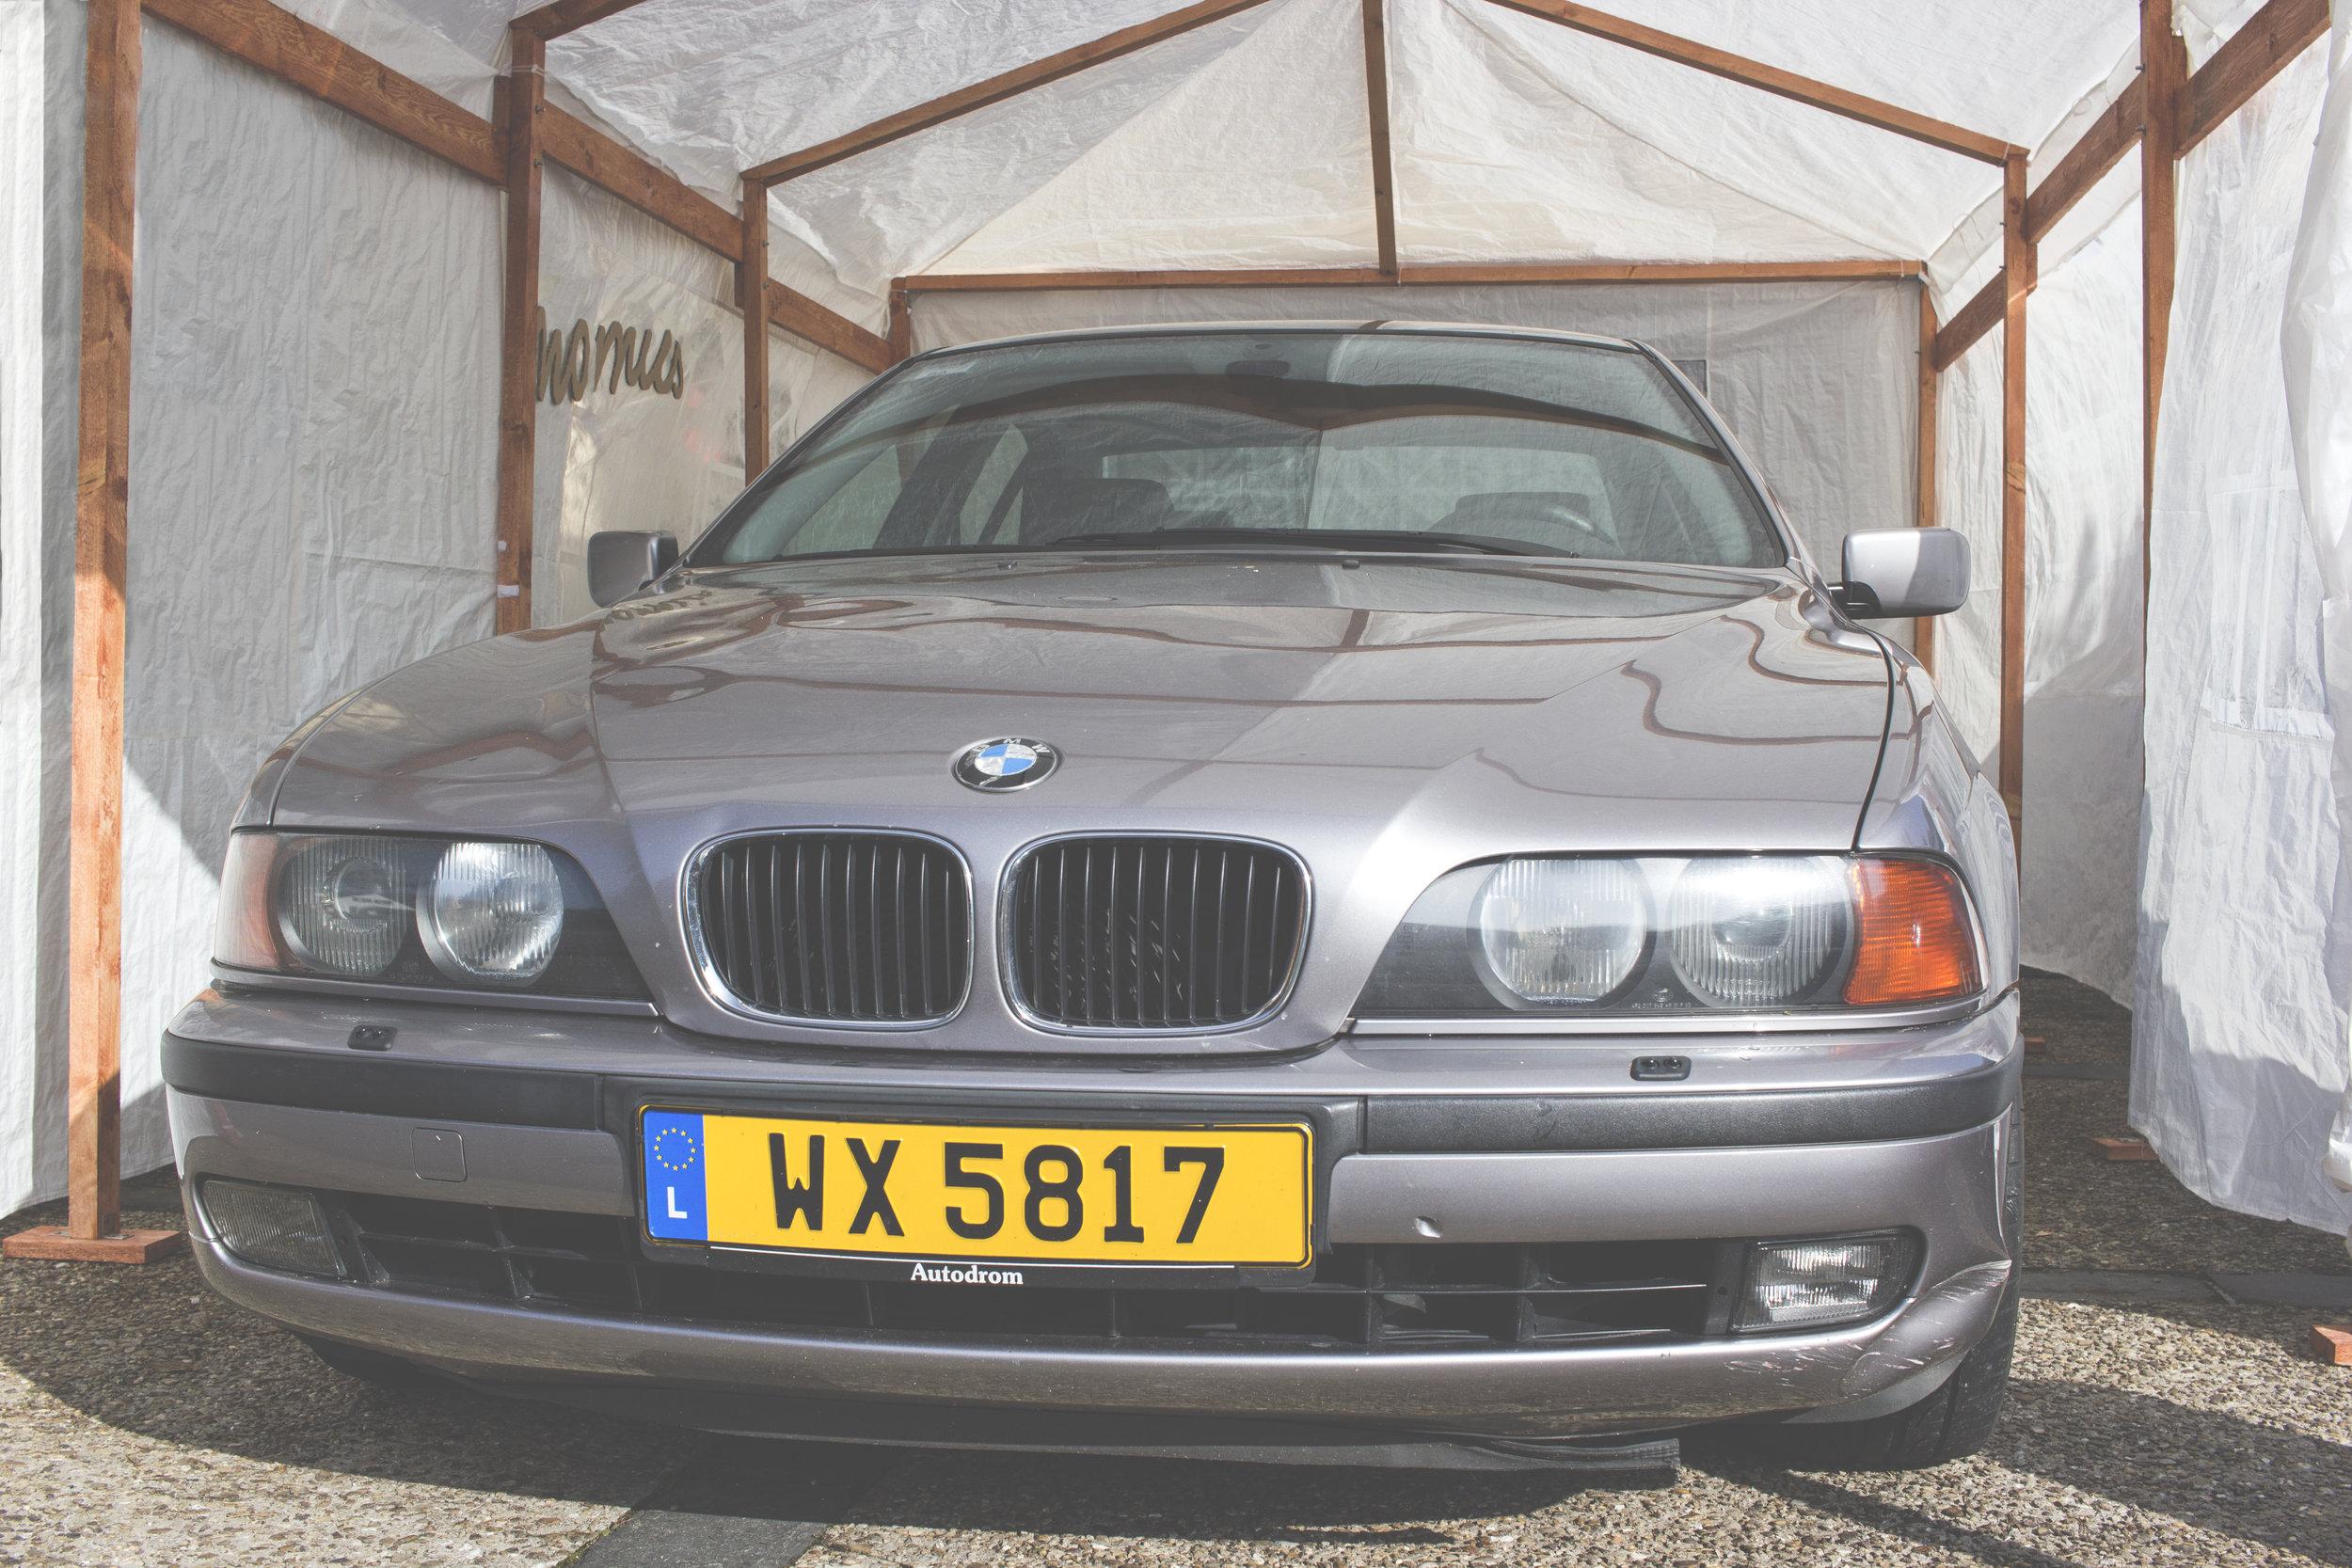 Mömus BMW E39 Pre Facelift pfl bumper front headlights